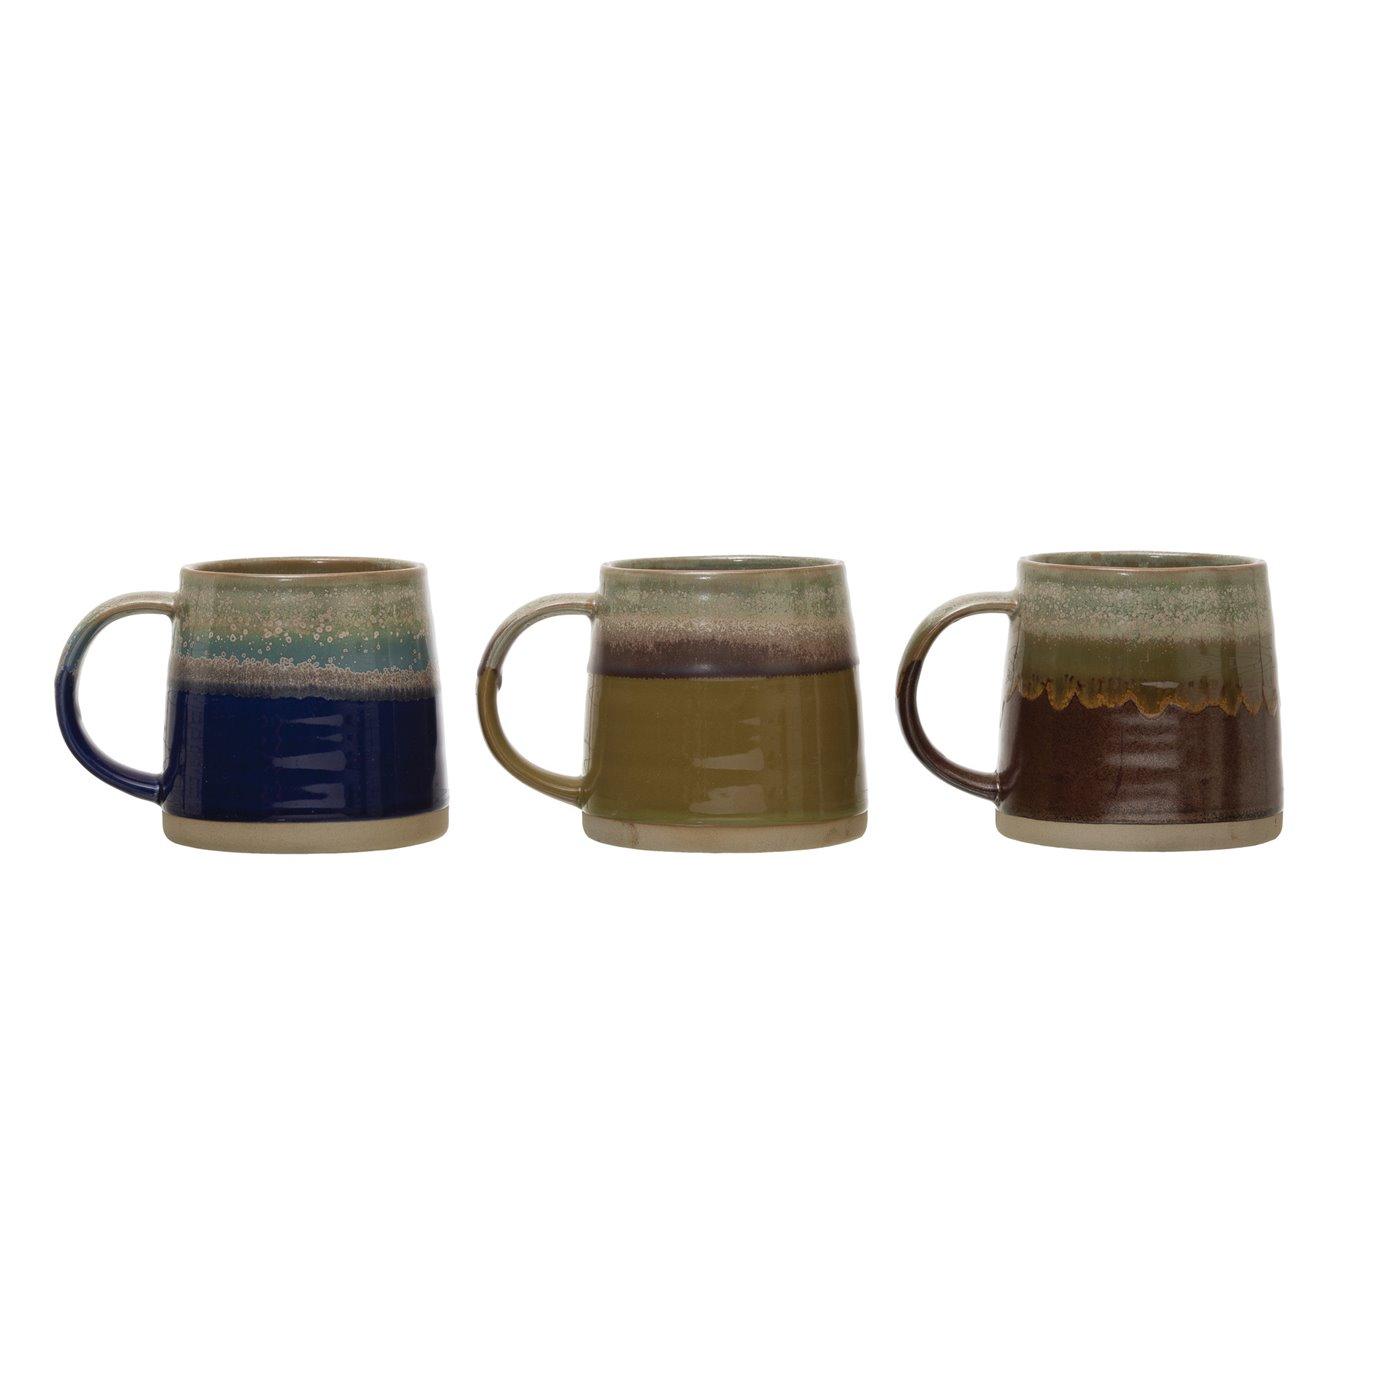 Stoneware Mug, Reactive Glaze, 3 Colors (Each One Will Vary)